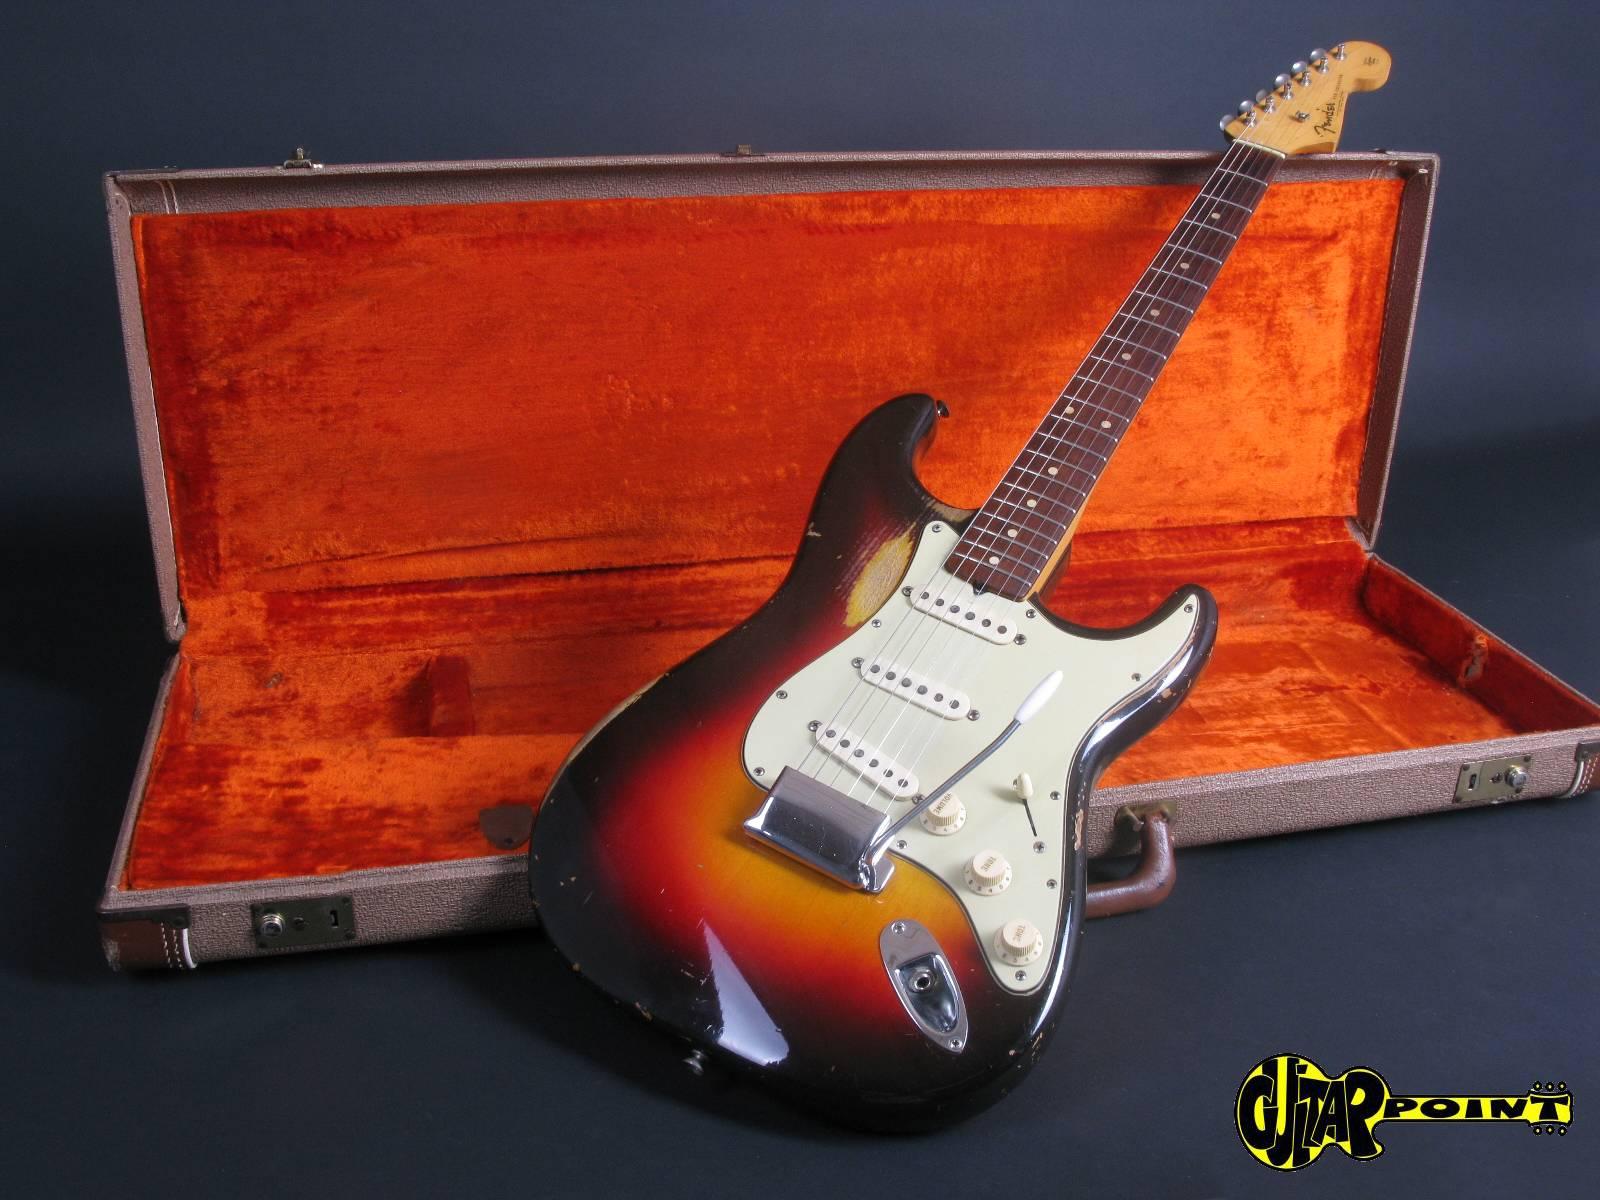 https://guitarpoint.de/app/uploads/products/1961-fender-stratocaster-3-tone-sunburst-3/Fender61StratSB_67053_10.jpg